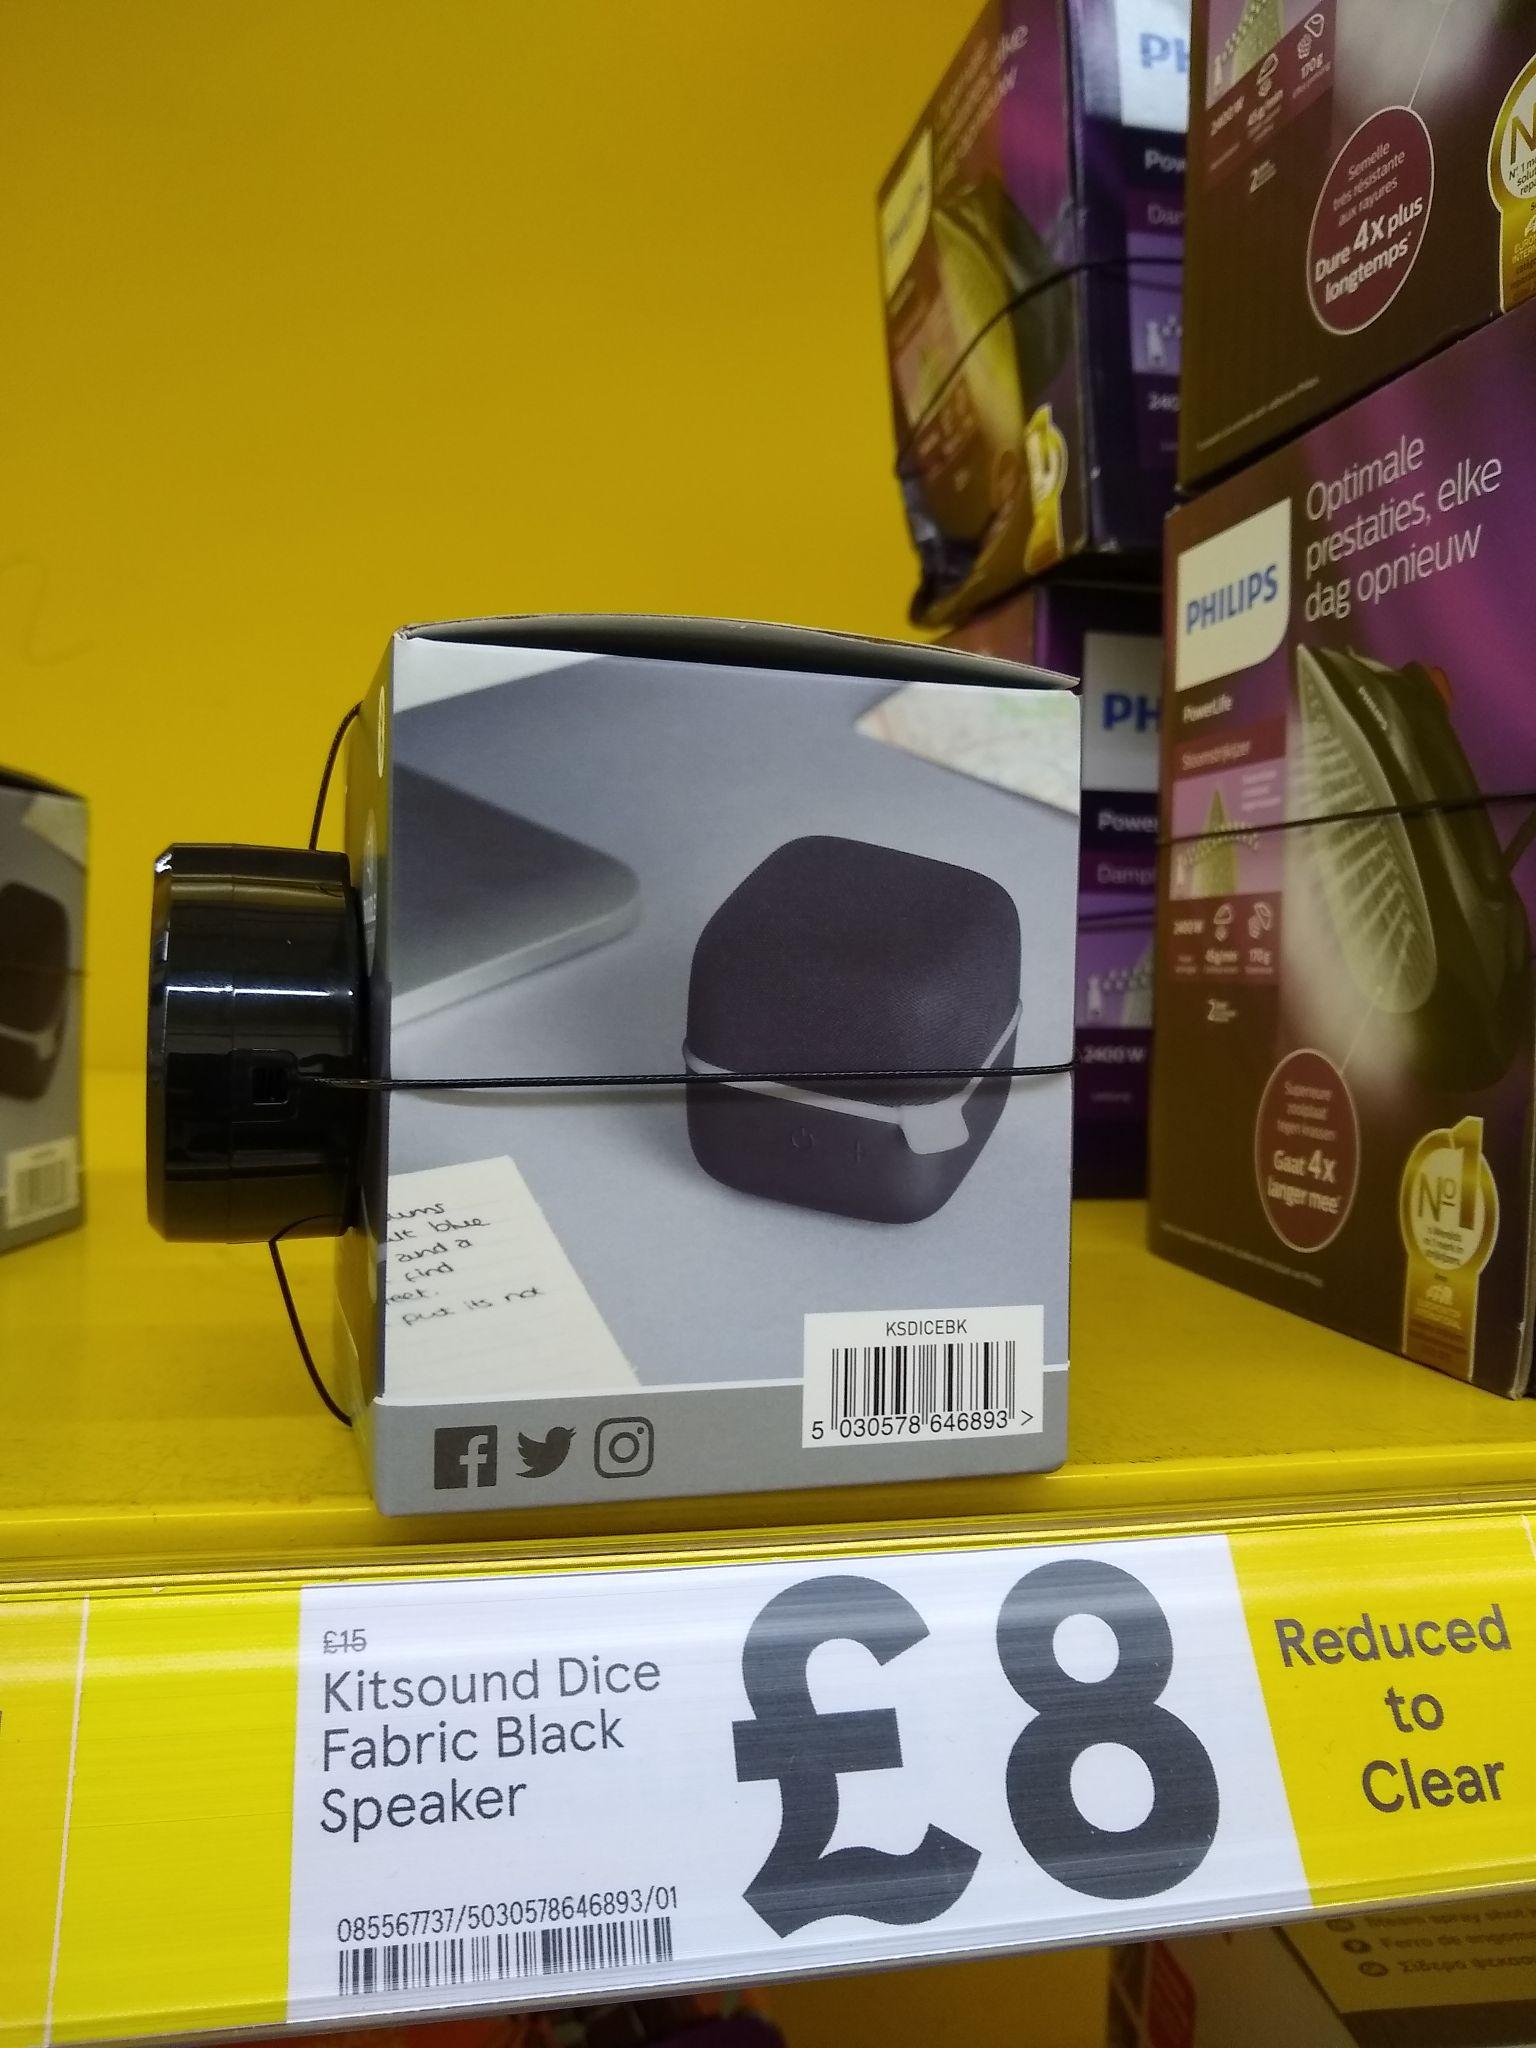 Kitsound dice fabric Bluetooth speaker - £8 instore @ Tesco (Pontardawe)